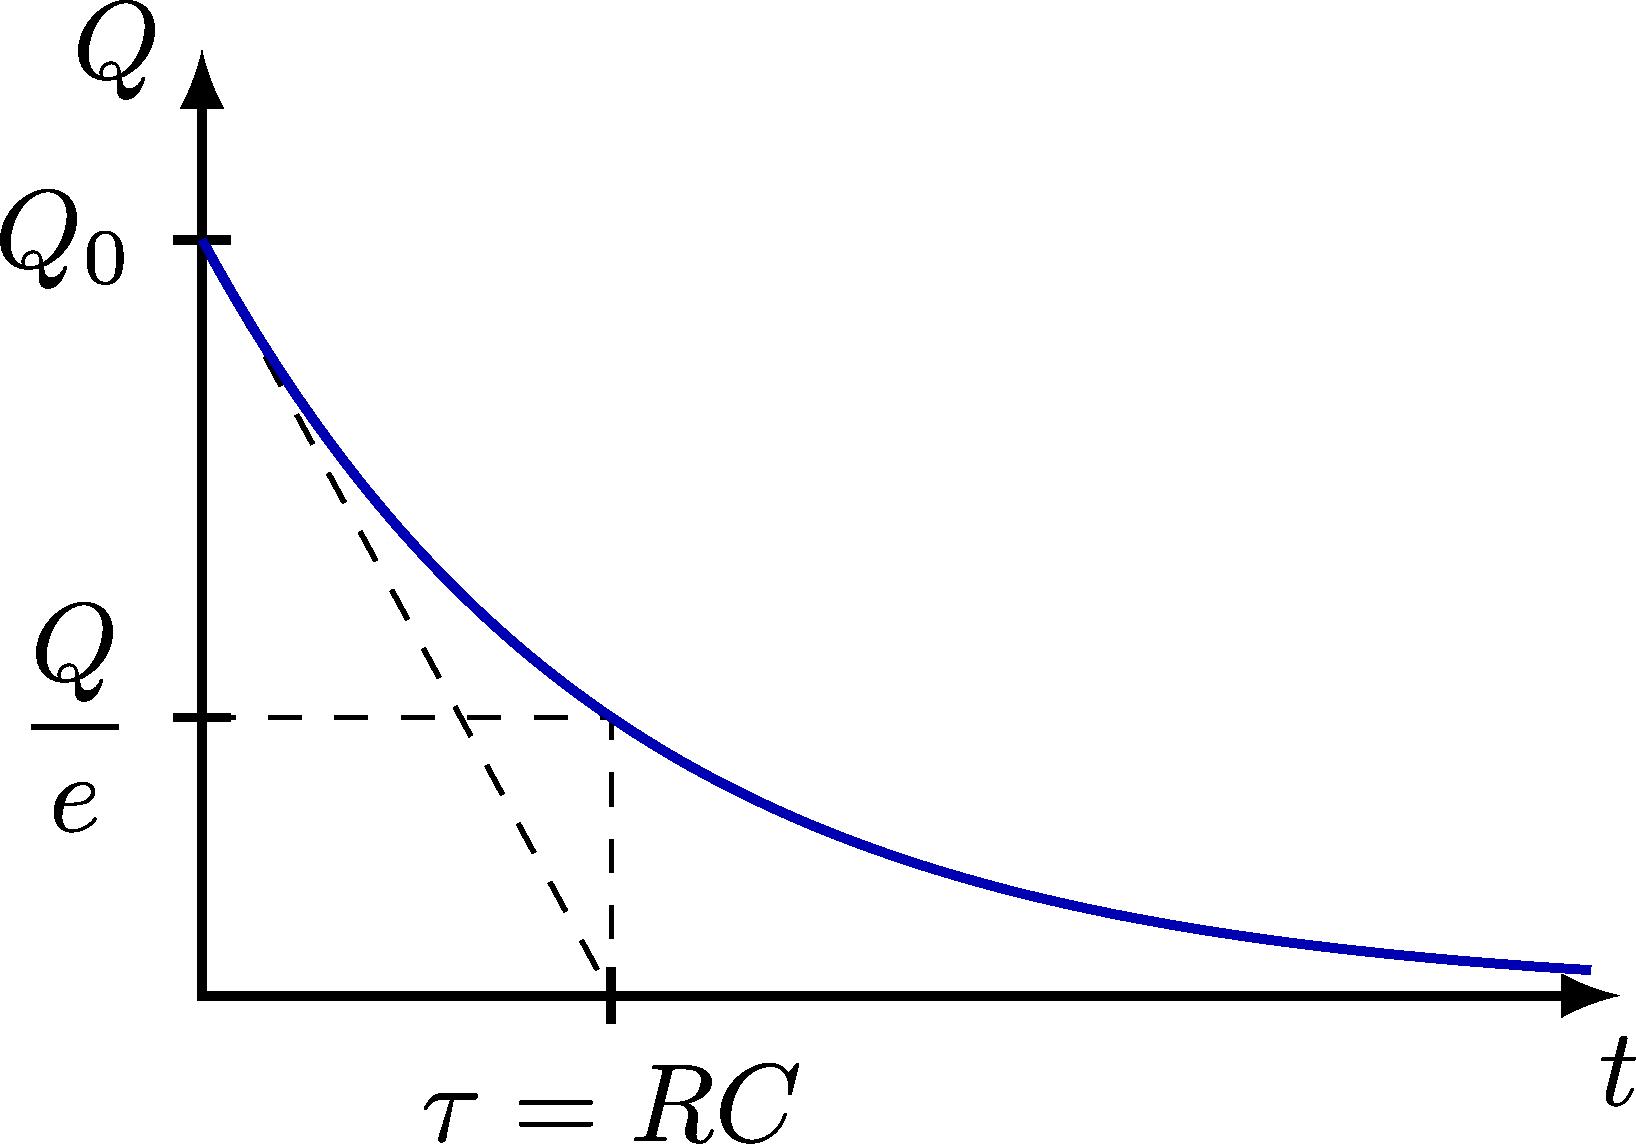 electric_circuit_plots-005.png